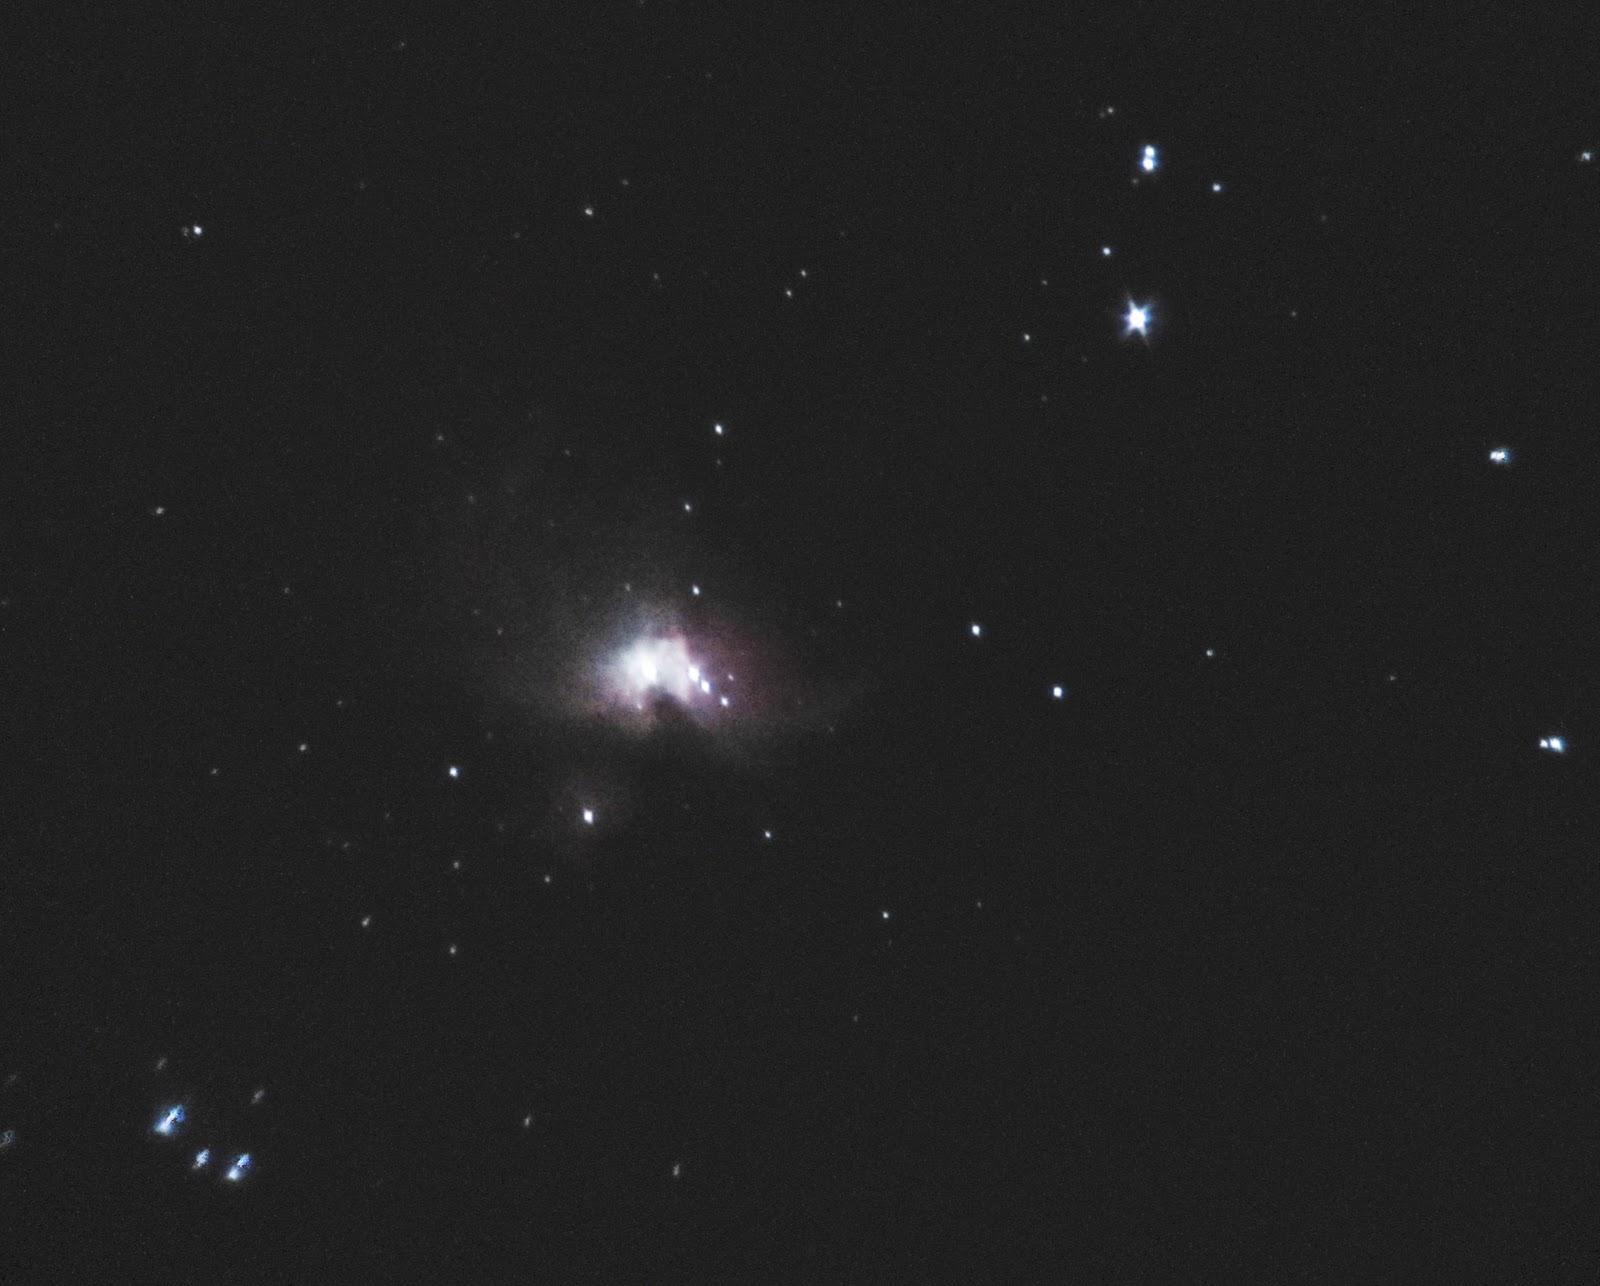 Images of a nebula through telescope spacehero